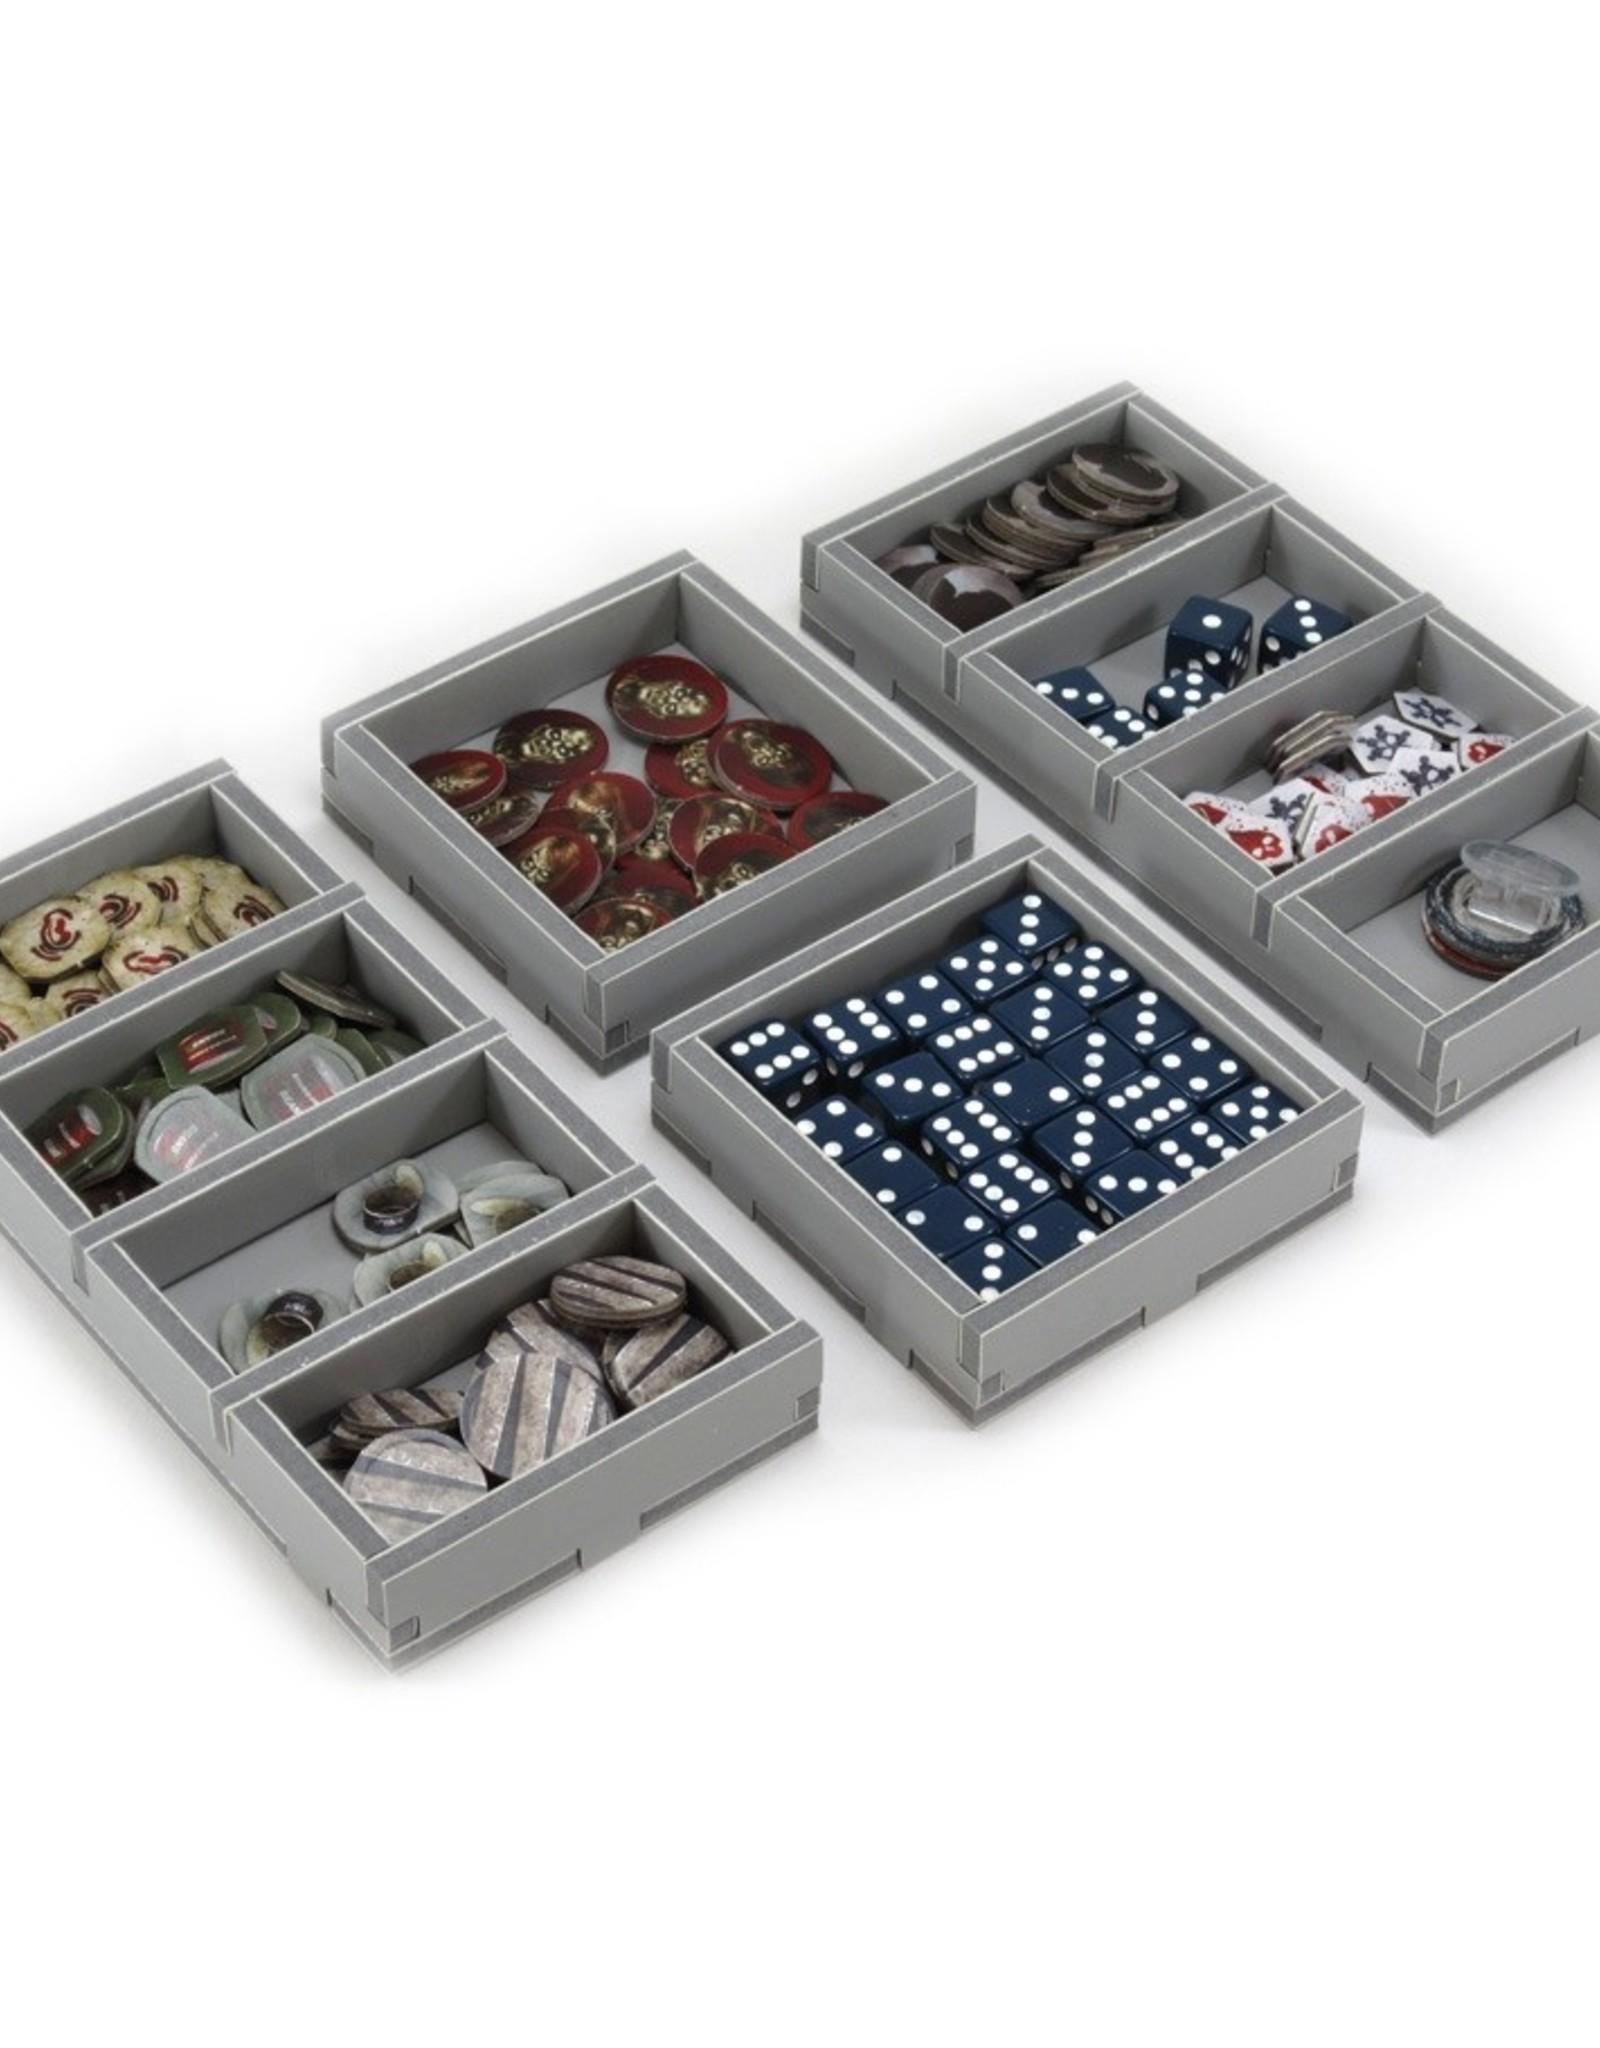 Folded Space Box Insert: Dead of Winter/Long Night